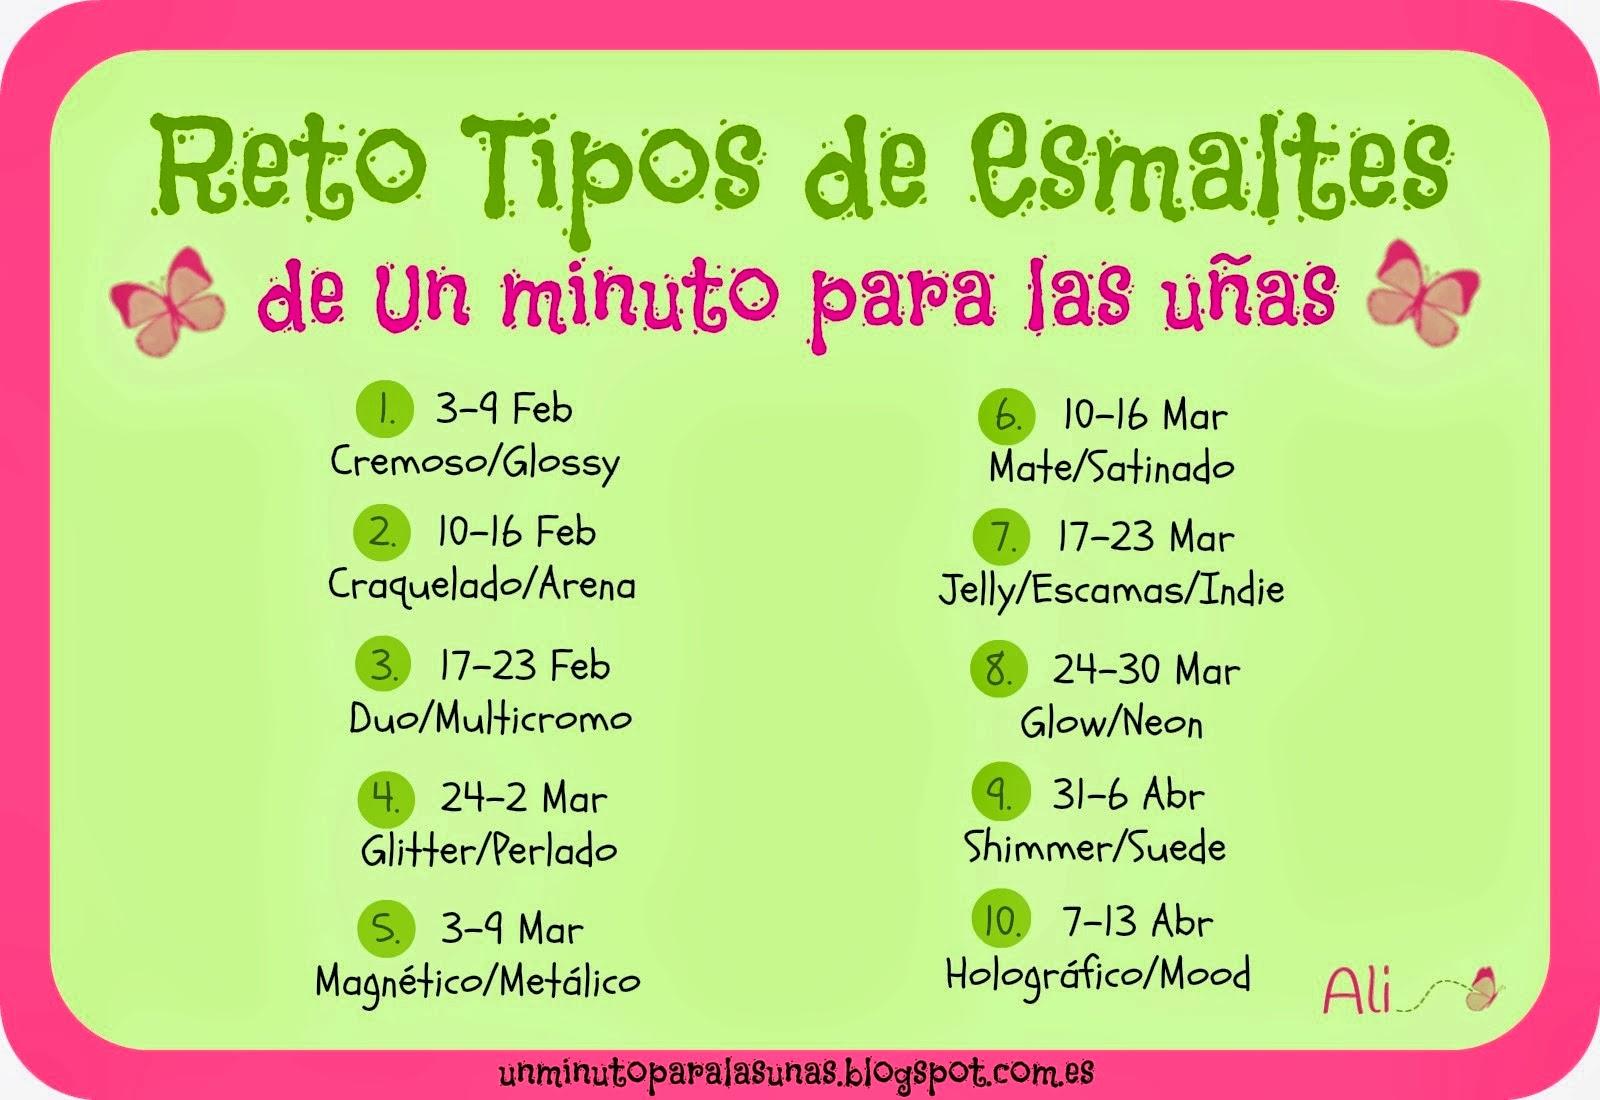 Little Fairy: Uñas: #RetoTiposdeEsmaltes1minuto 1. Cremoso/Glossy